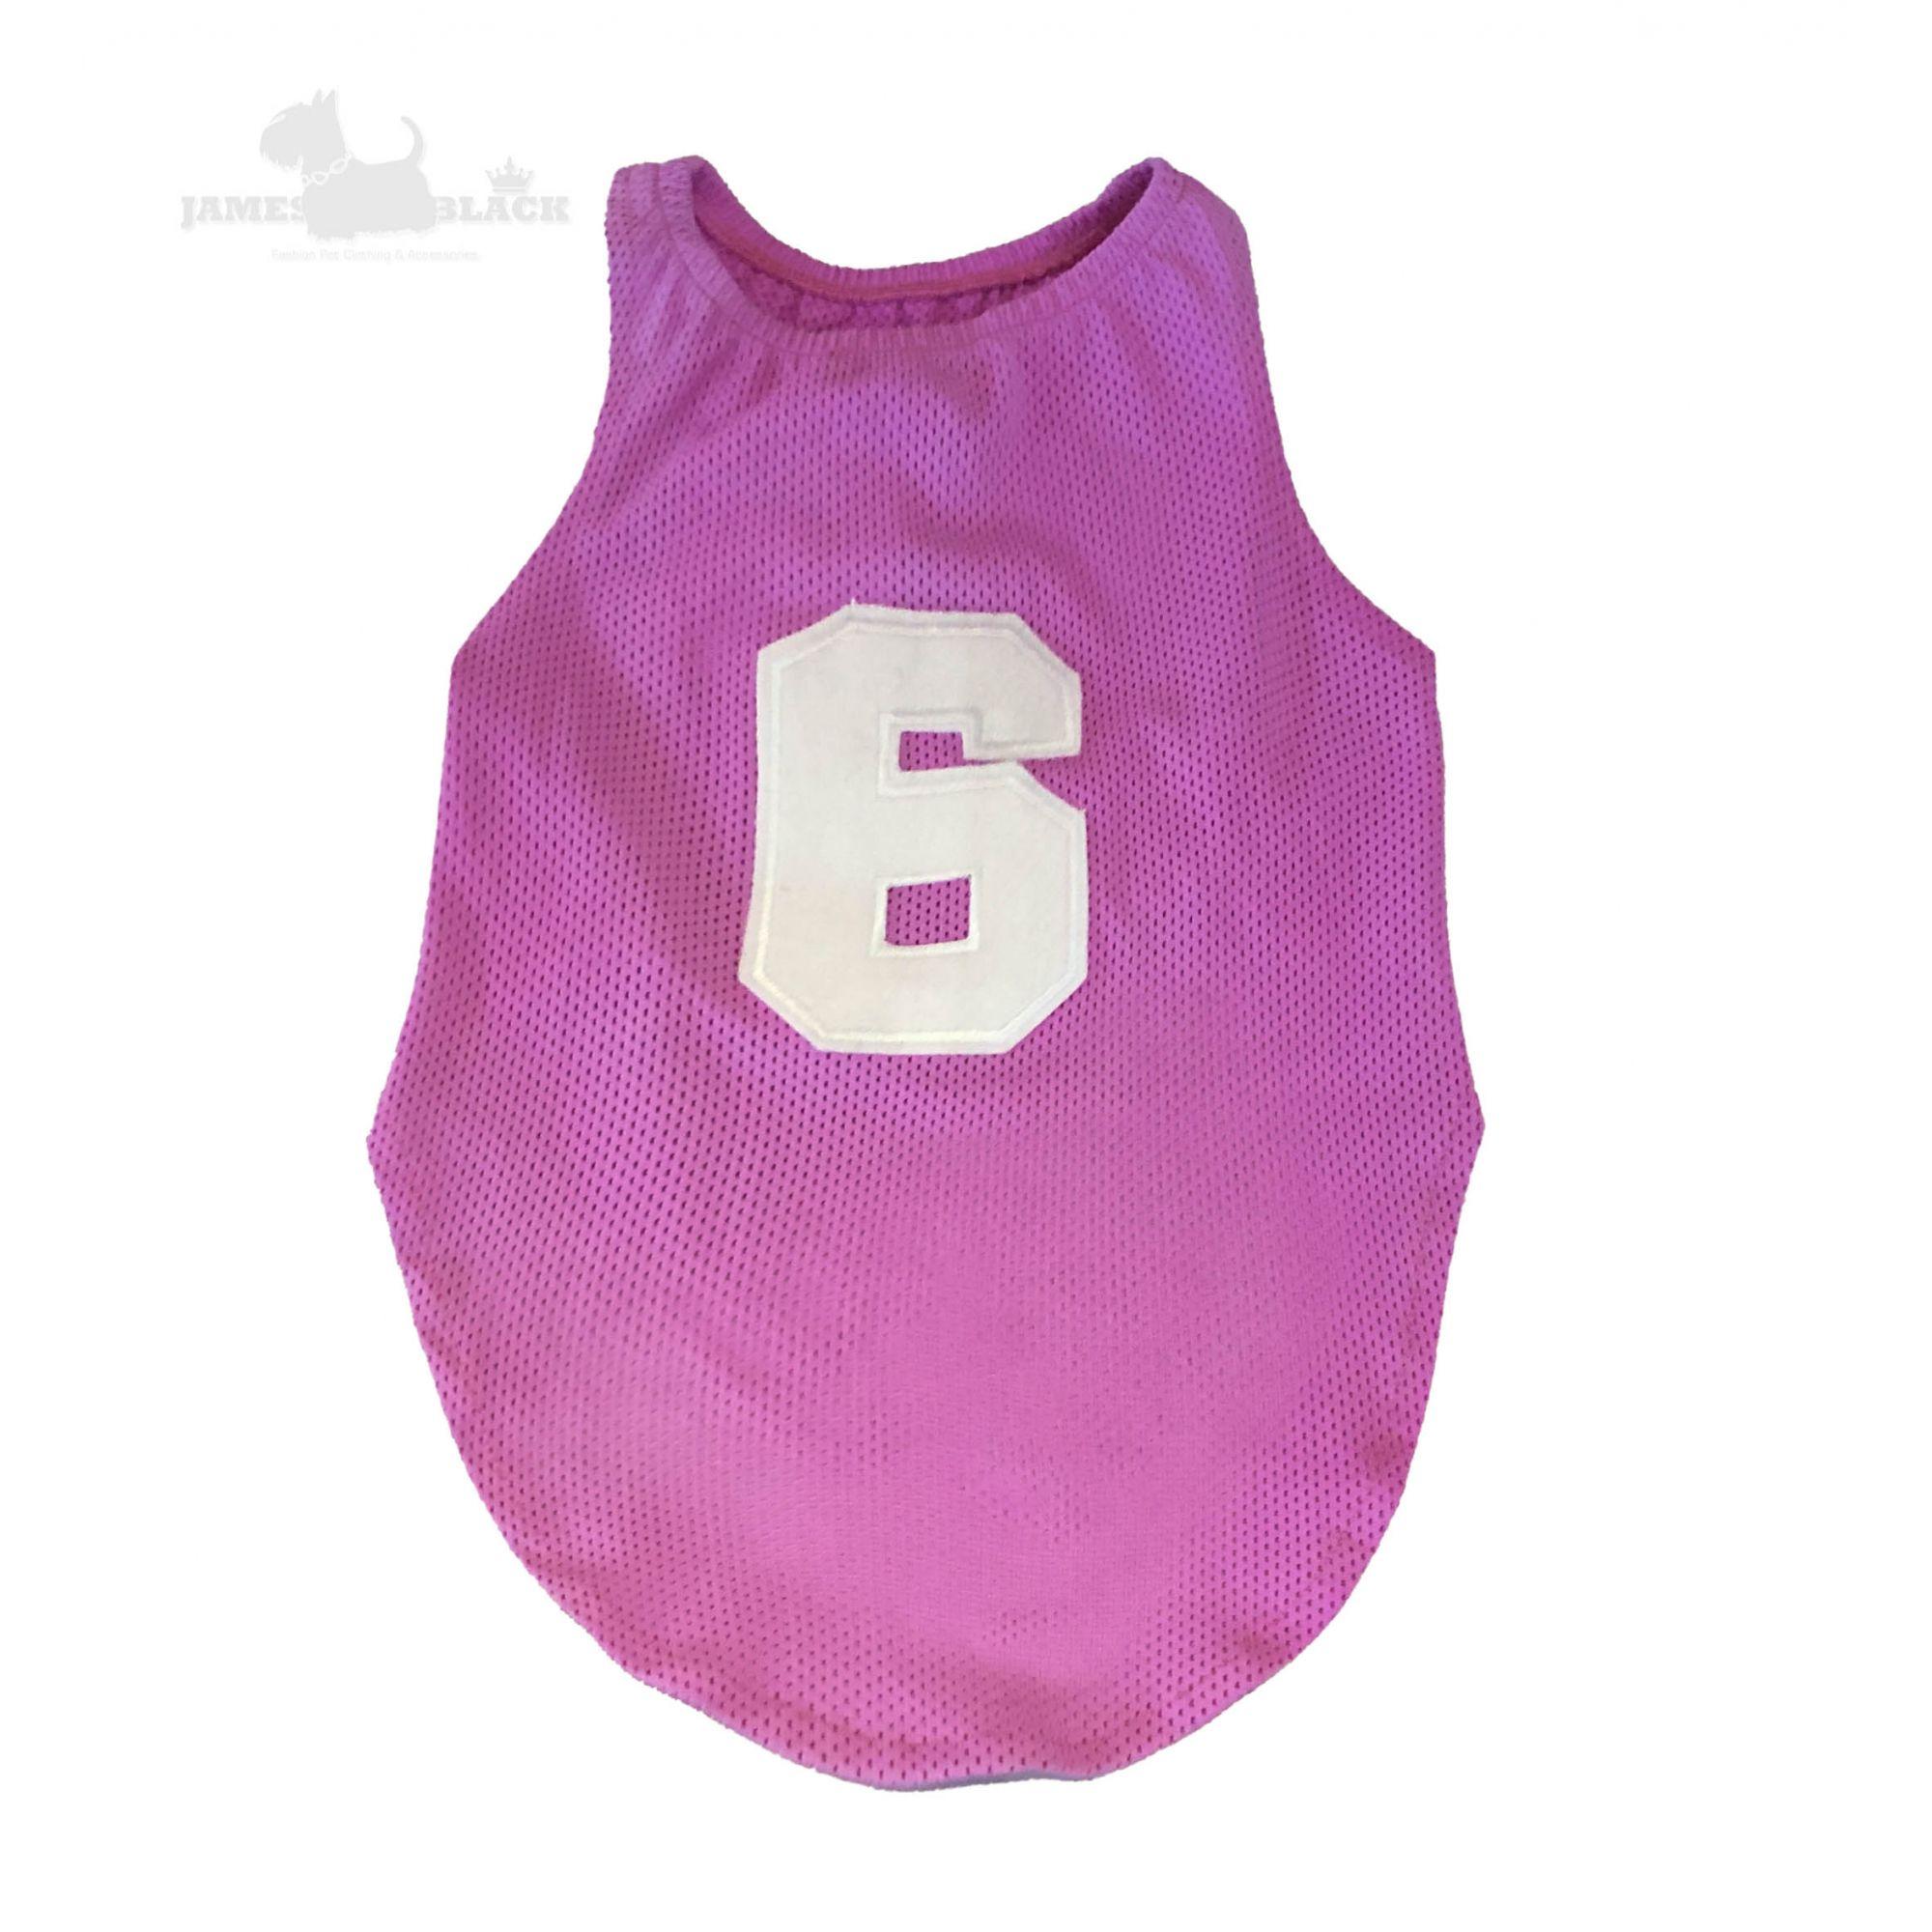 Camiseta Dryfit Rosa Furos Medios Seis